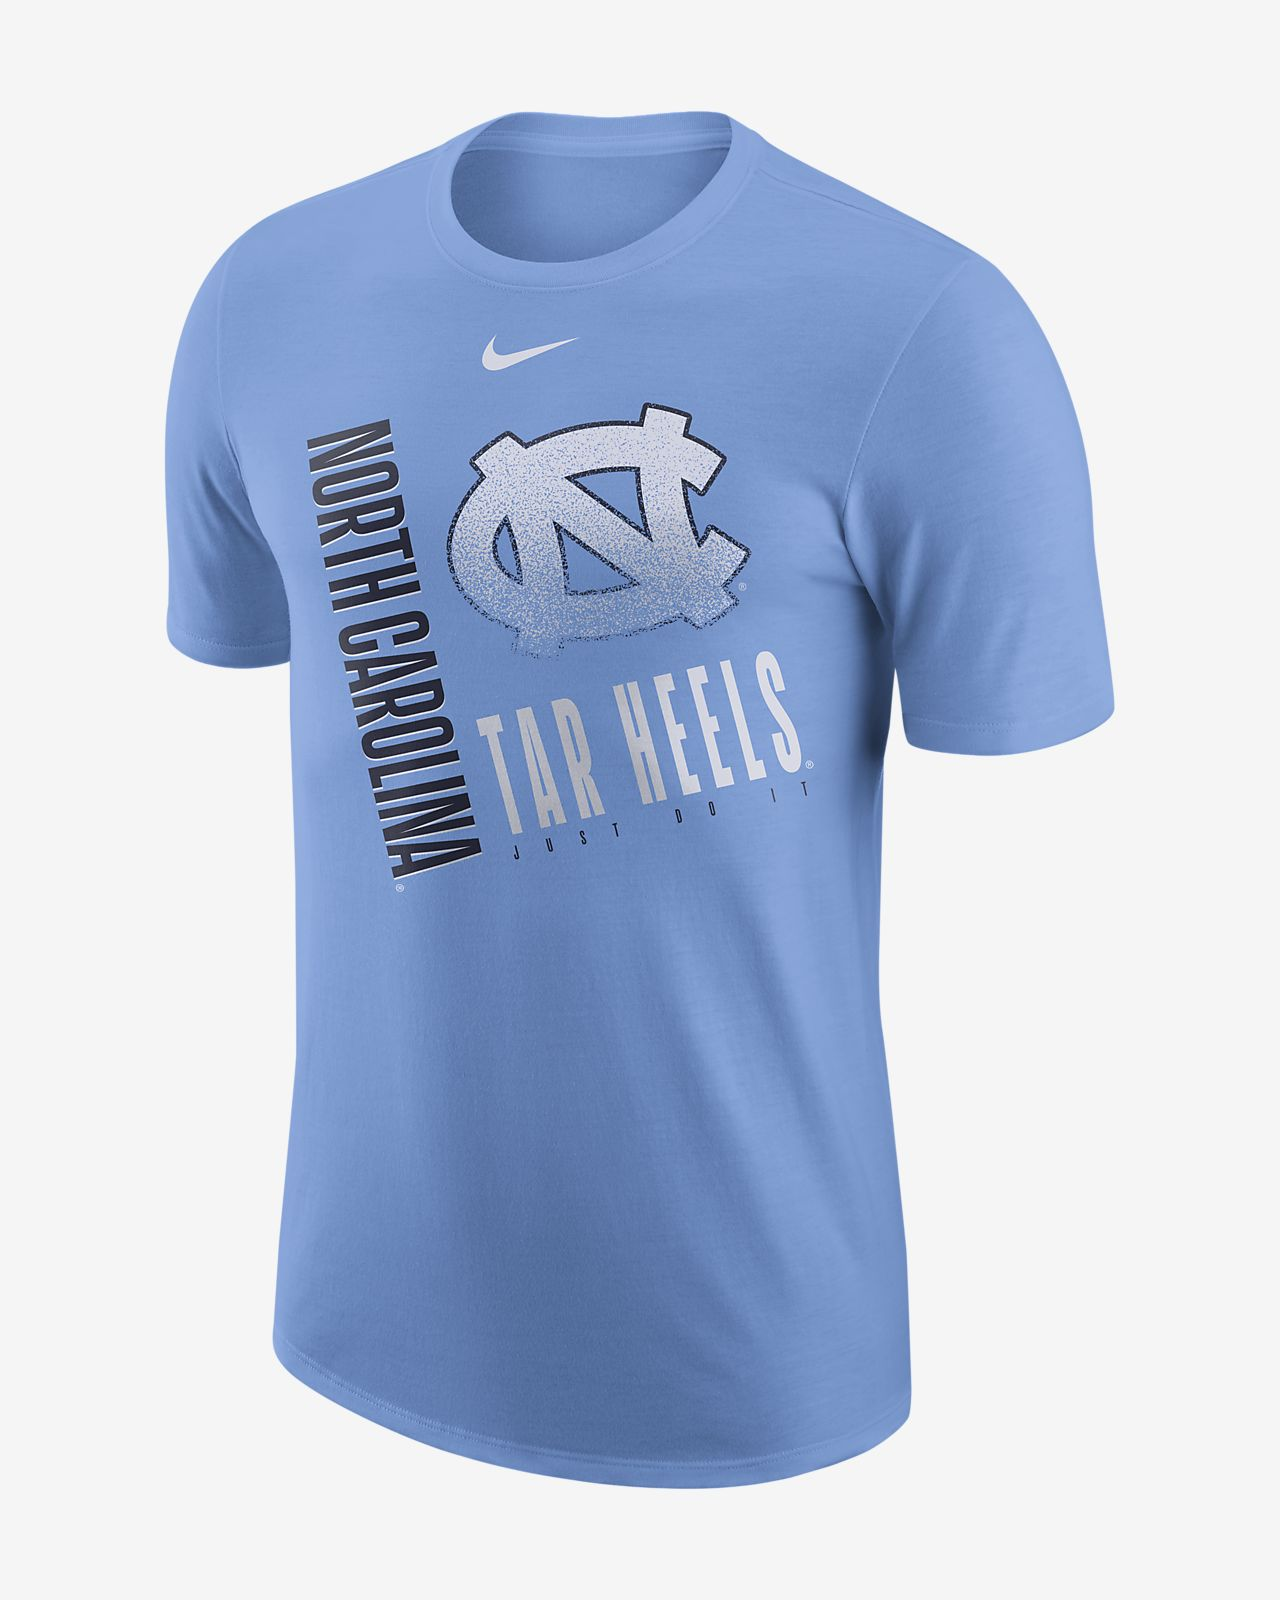 ae6c46ecd Nike College Dri-FIT (UNC) Men's JDI T-Shirt. Nike.com